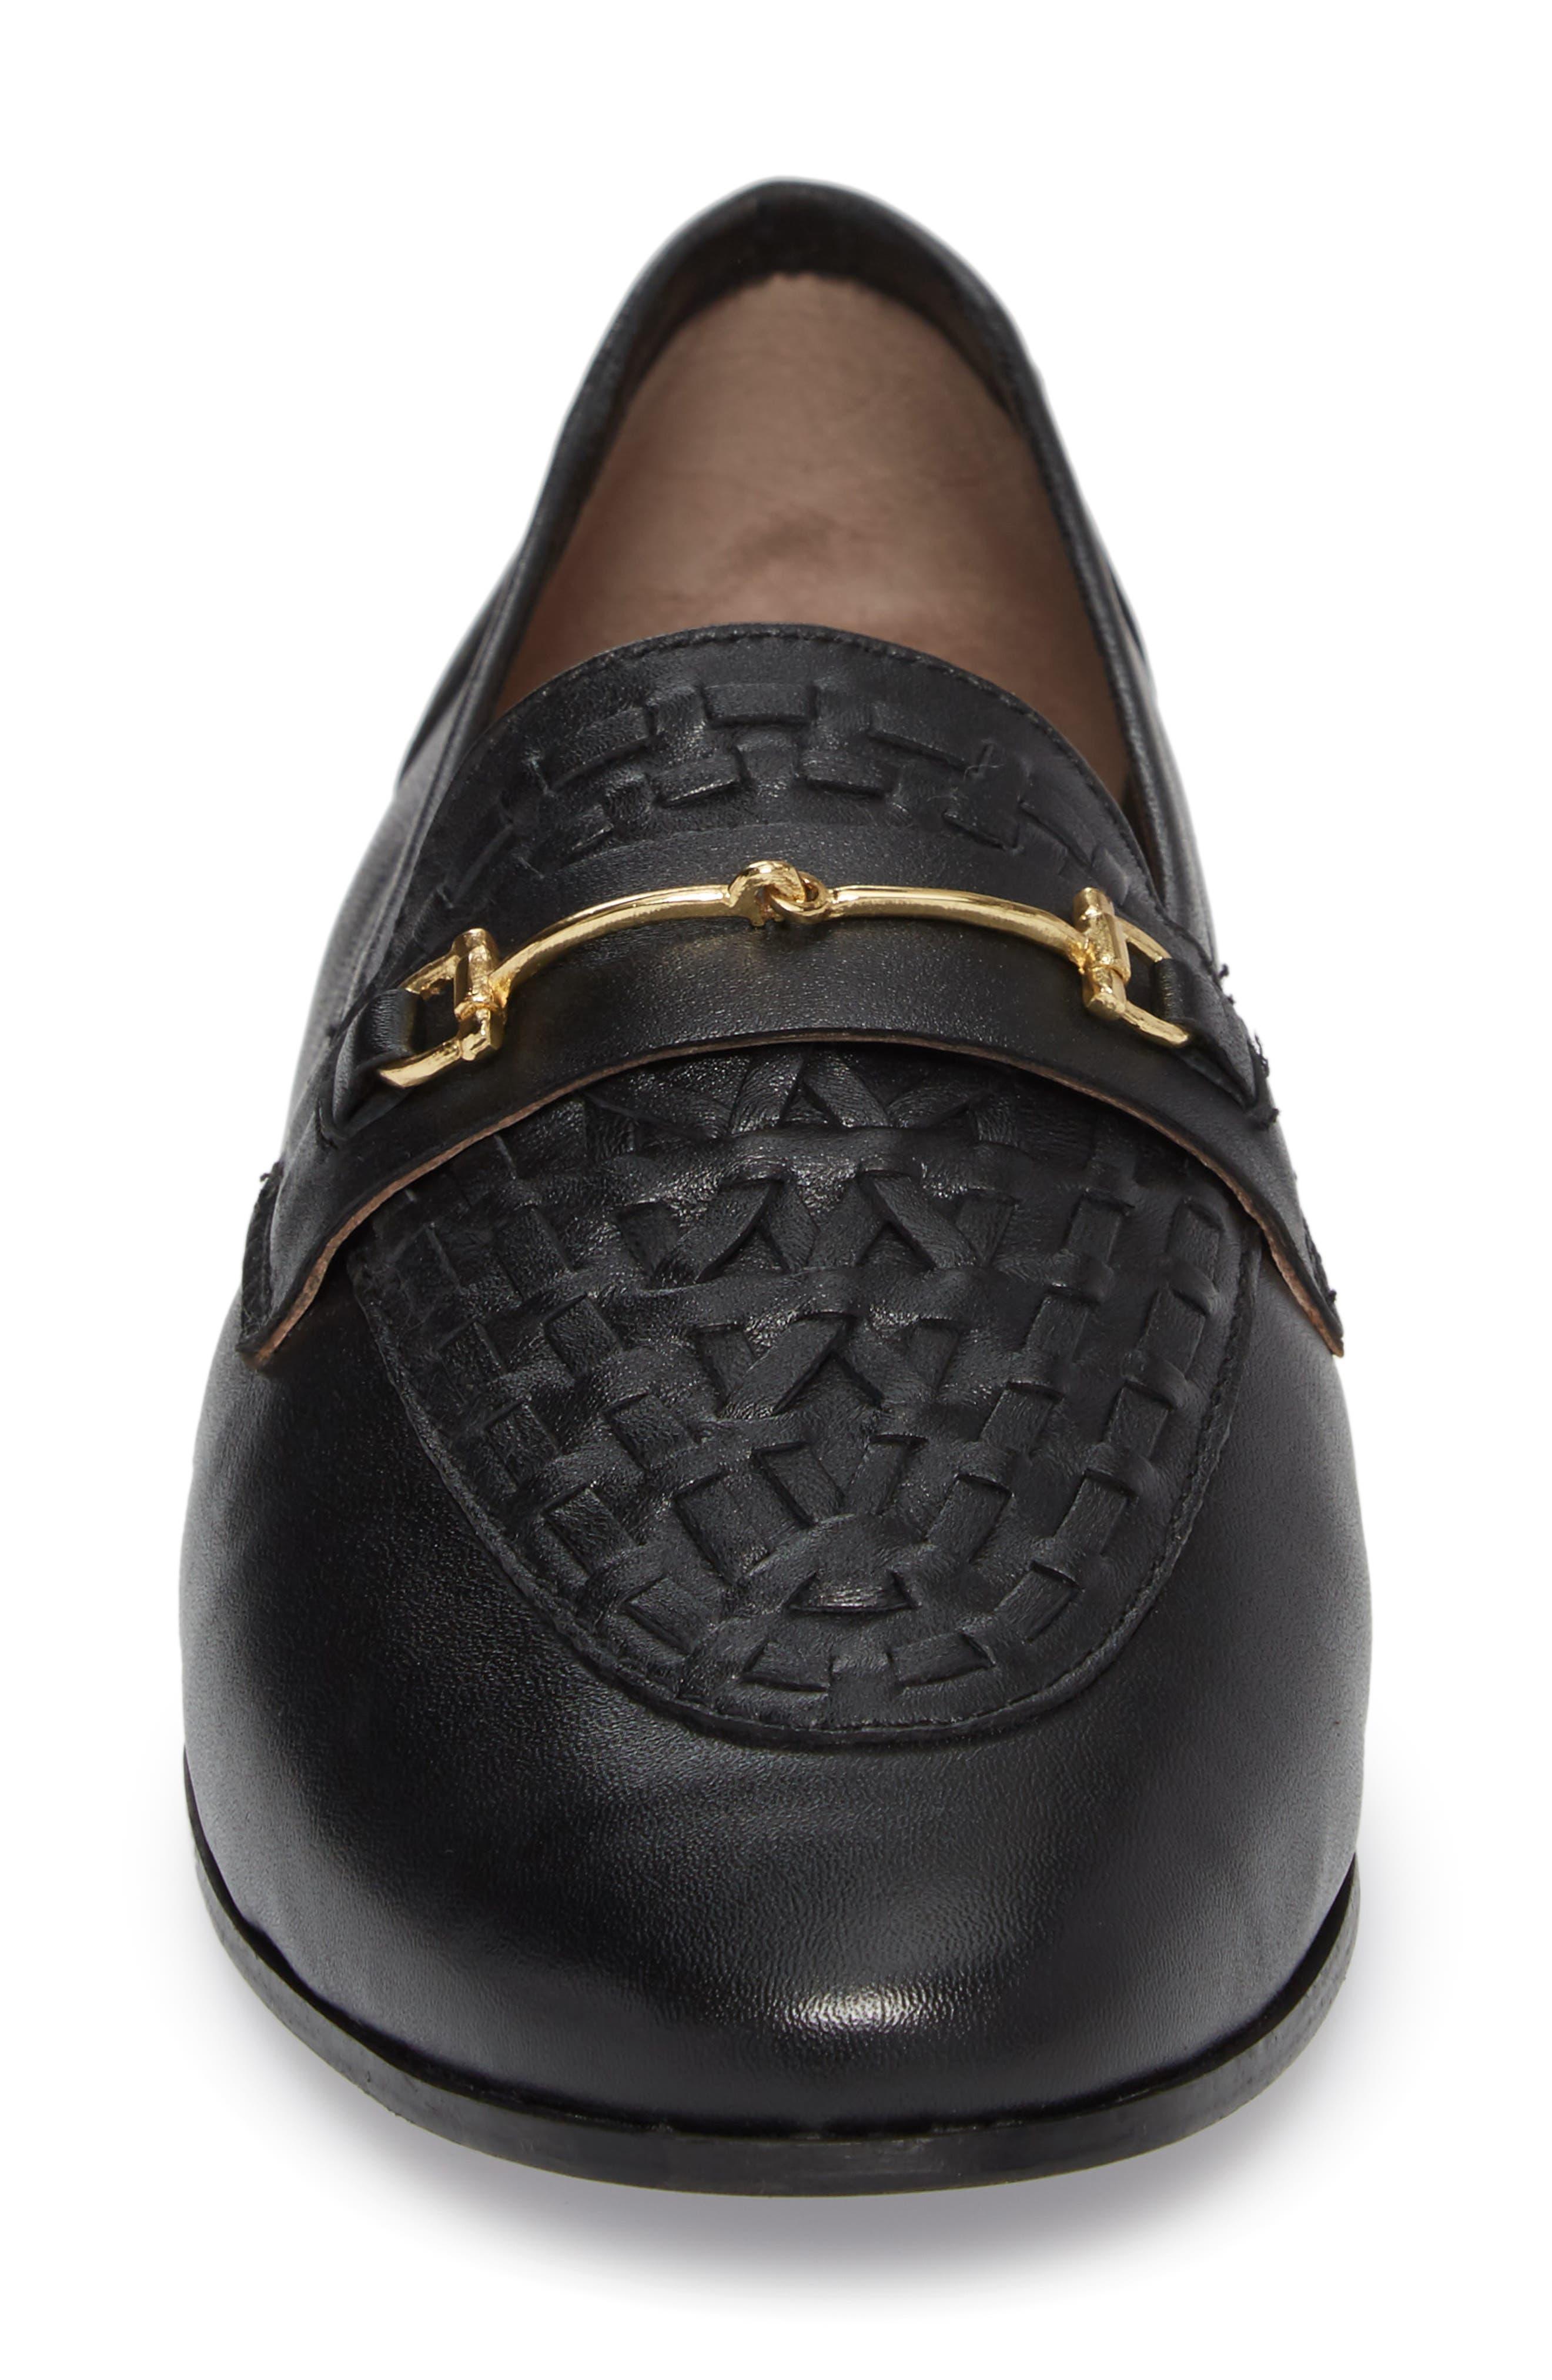 Kingley Woven Loafer,                             Alternate thumbnail 4, color,                             Black